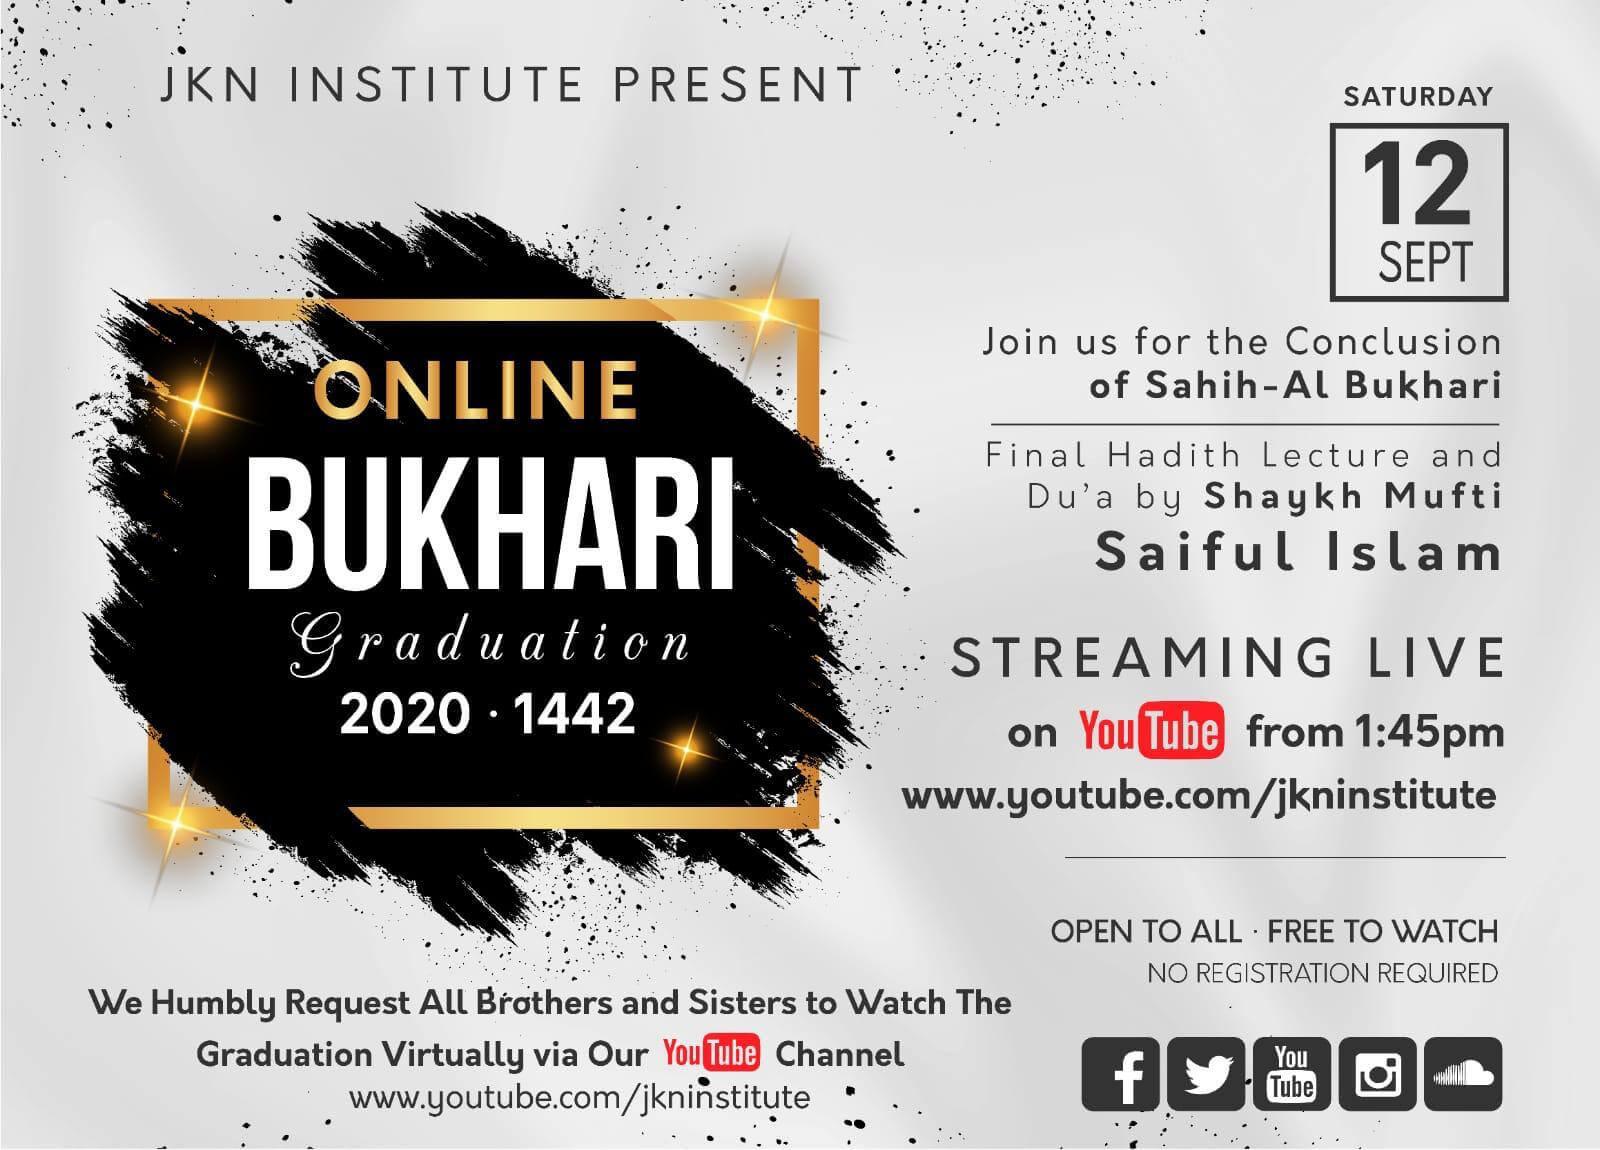 Online Bukhari Graduation